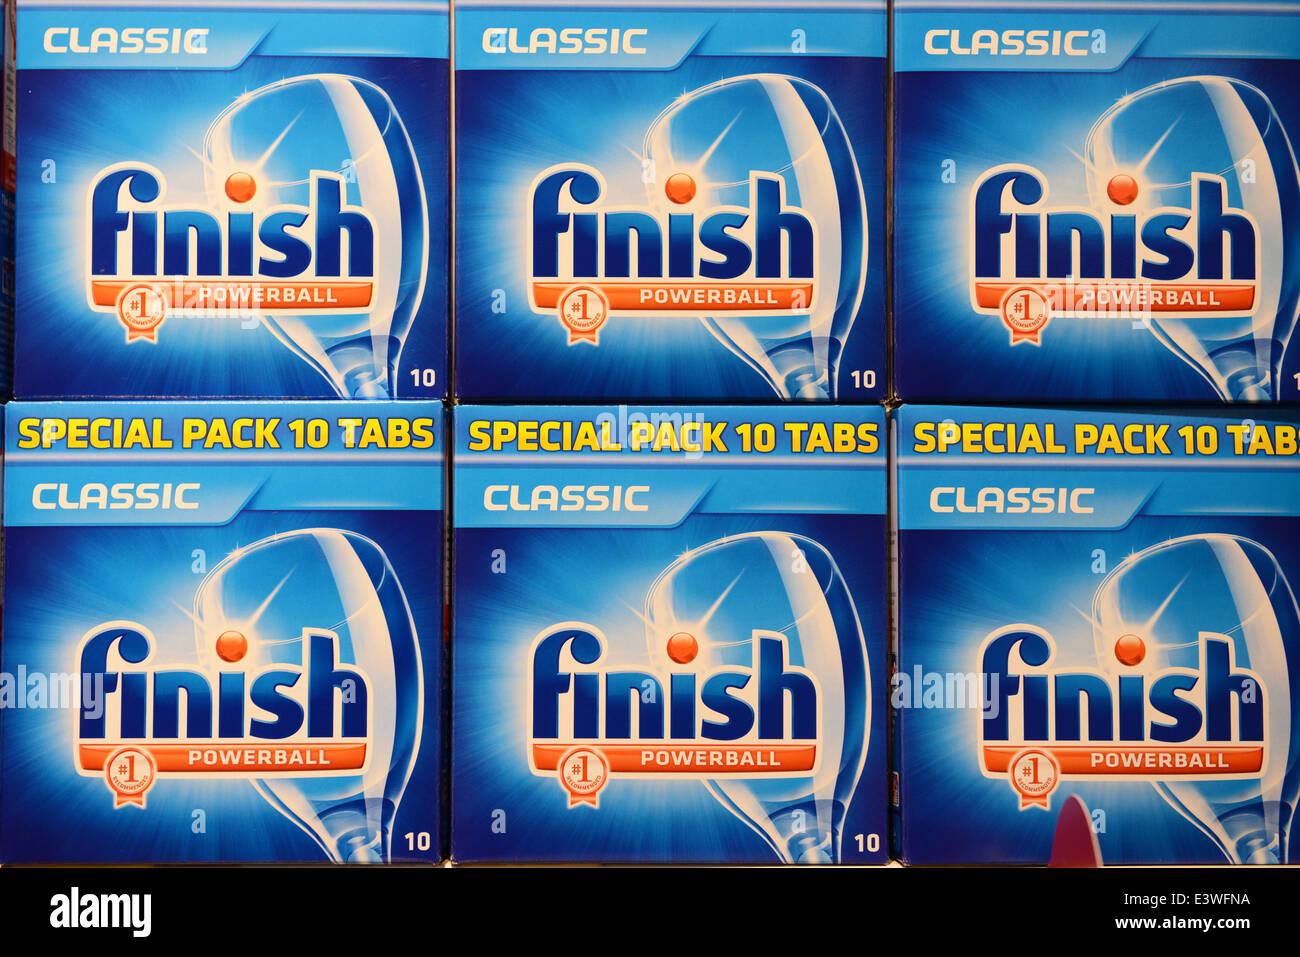 Finish Powerball Dishwashing Tablets - Stock Image